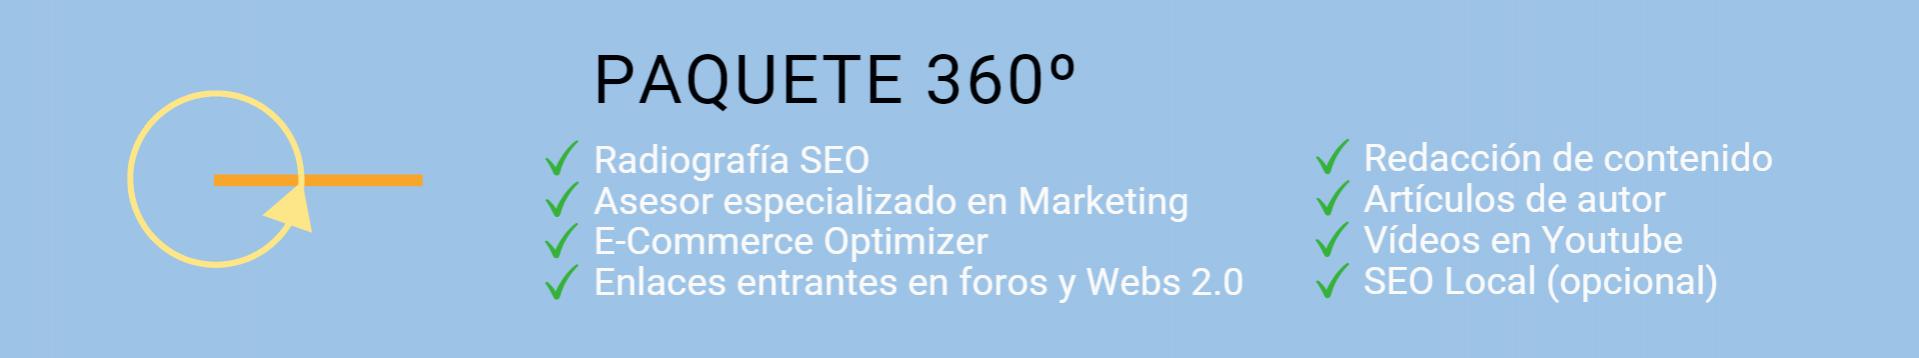 Paquete experto SEO 360